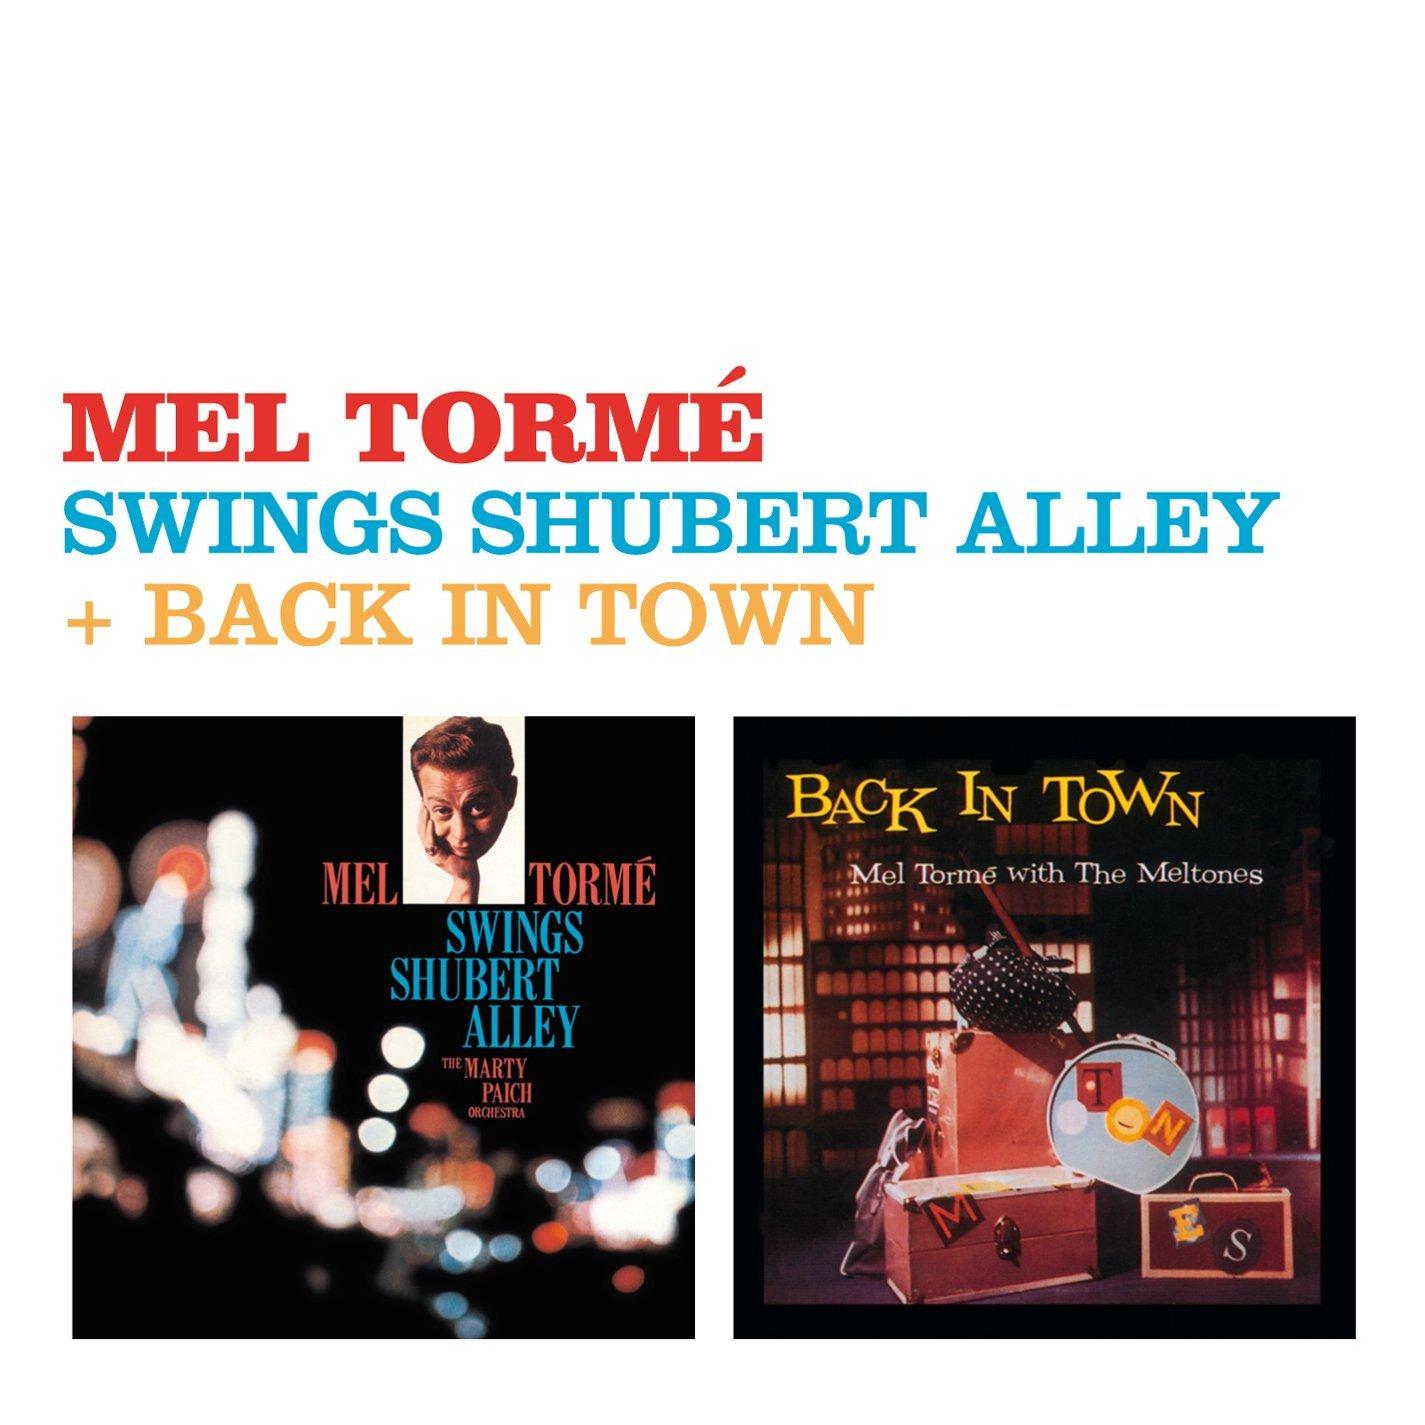 MEL TORME - SWINGS SHUBERT ALLEY + BACK IN TOWN (CD)